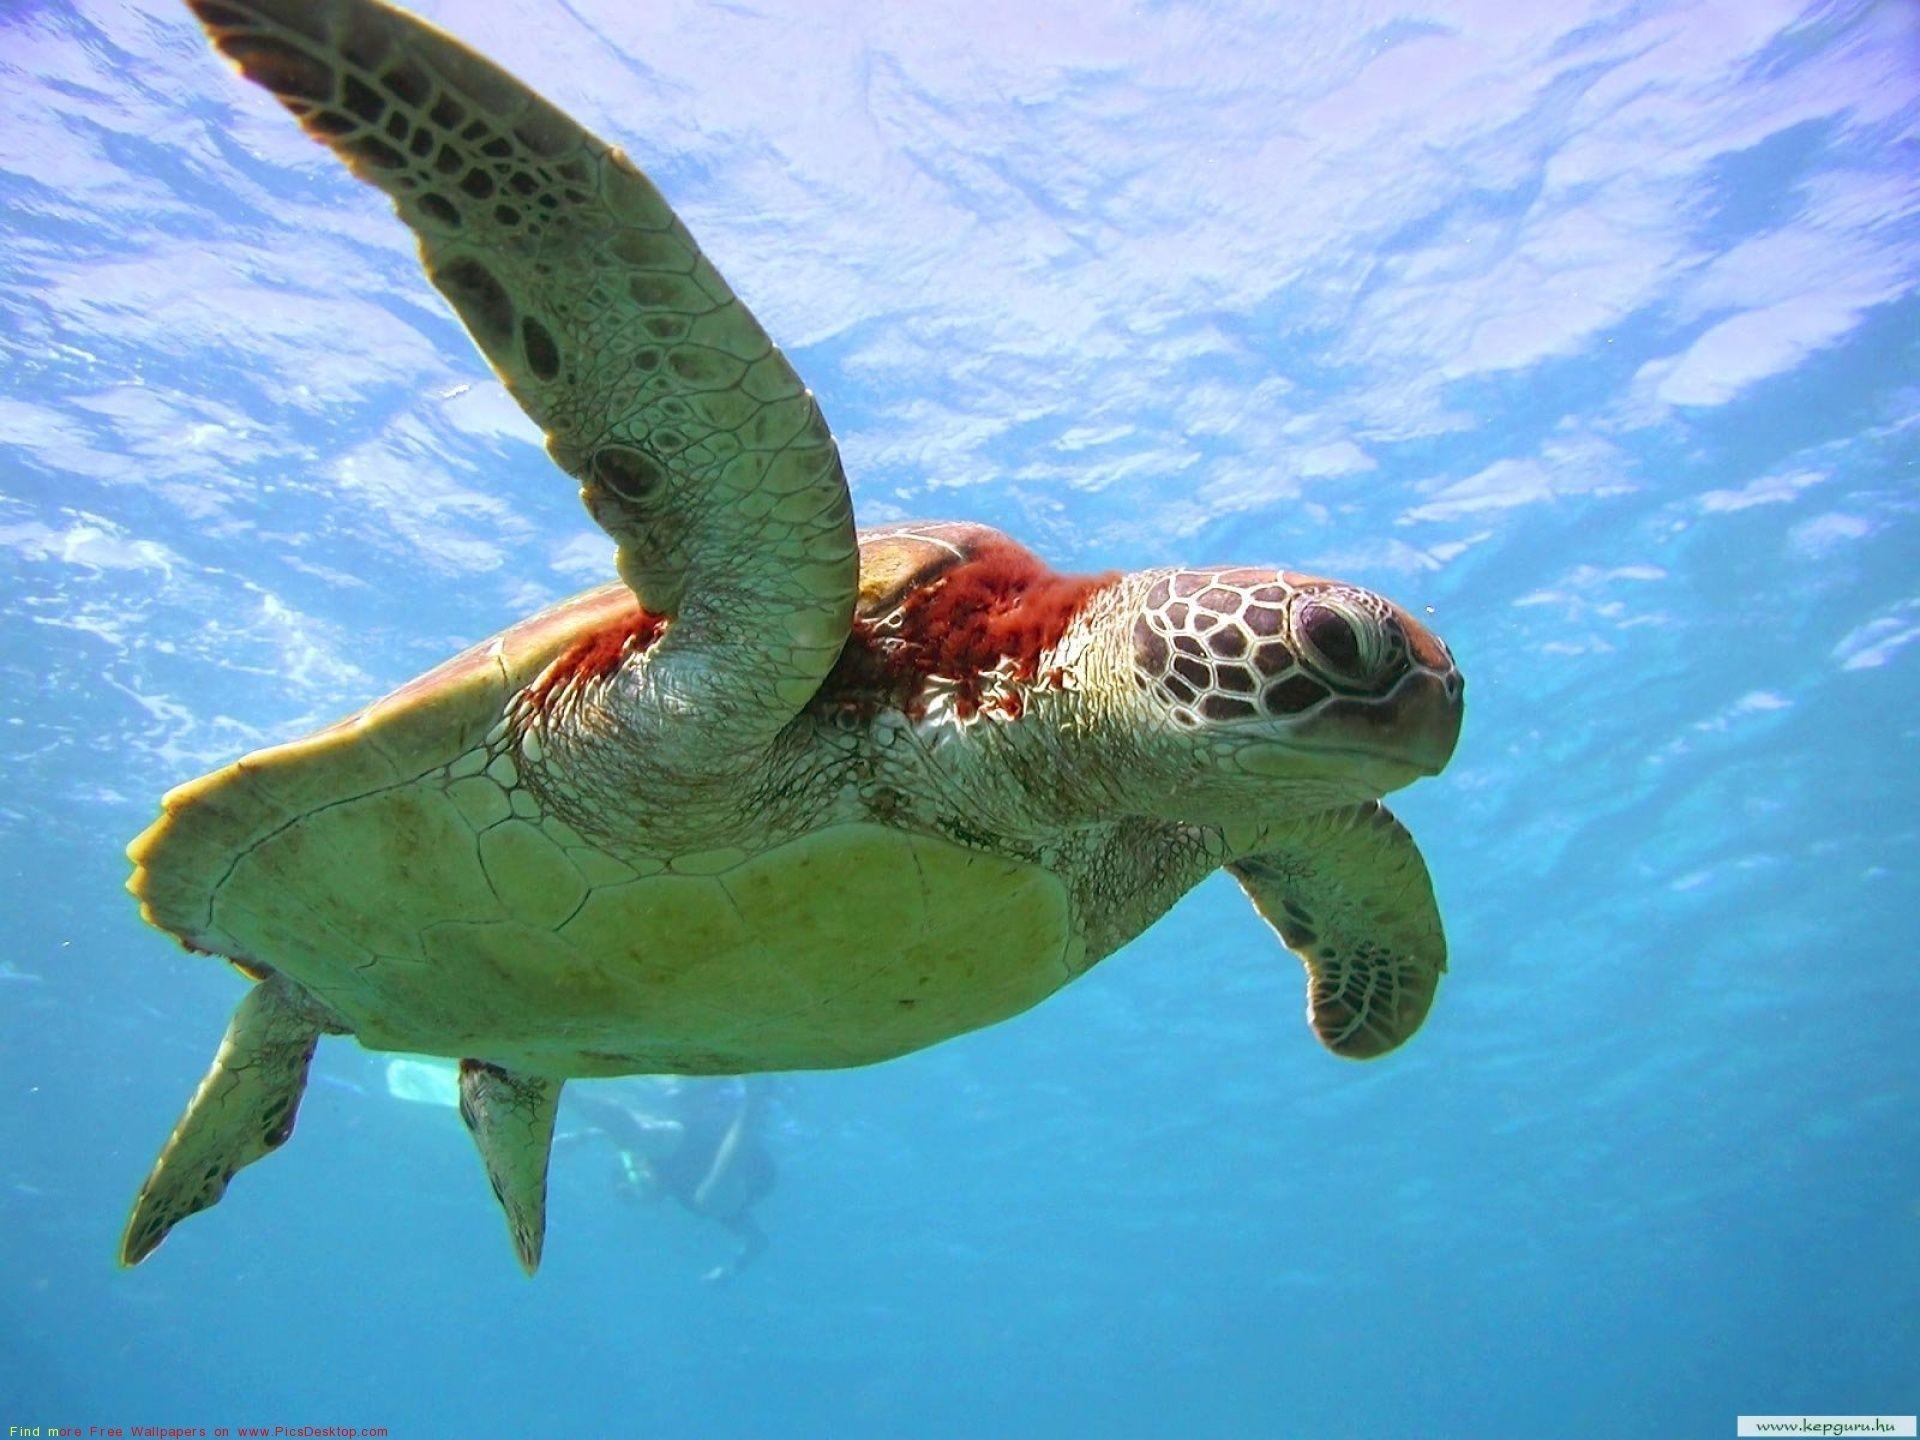 Ocean Life Free Desktop Backgrounds collection. #31